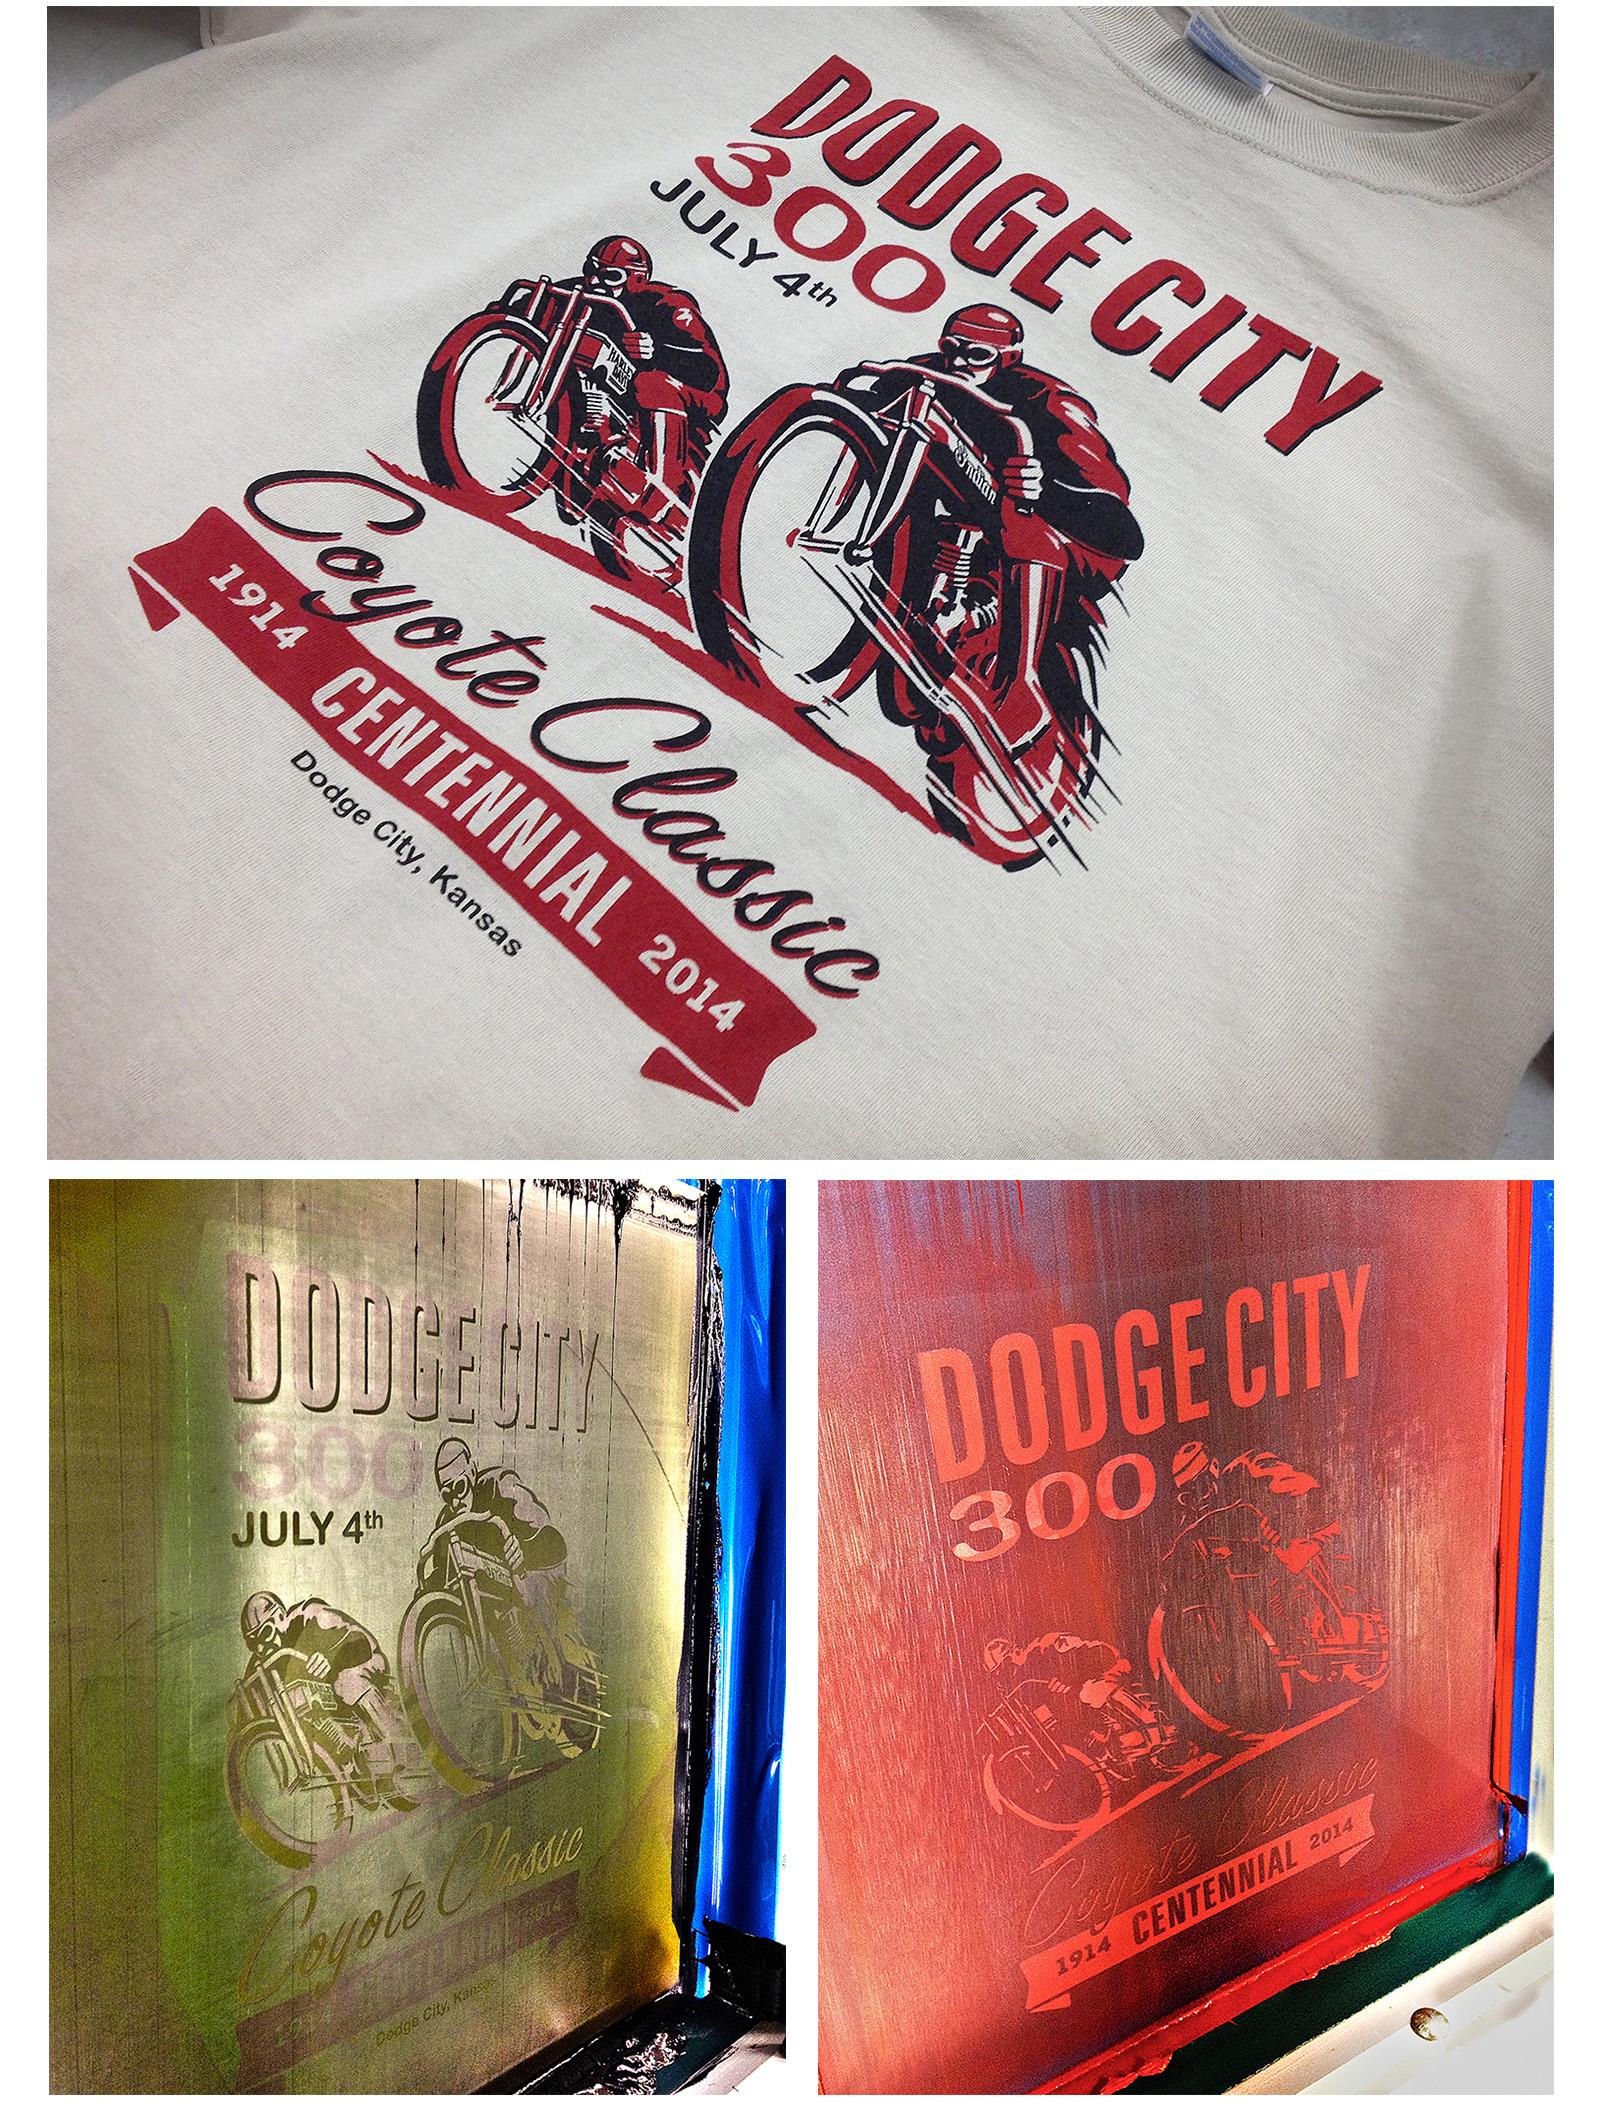 dodgecity300details